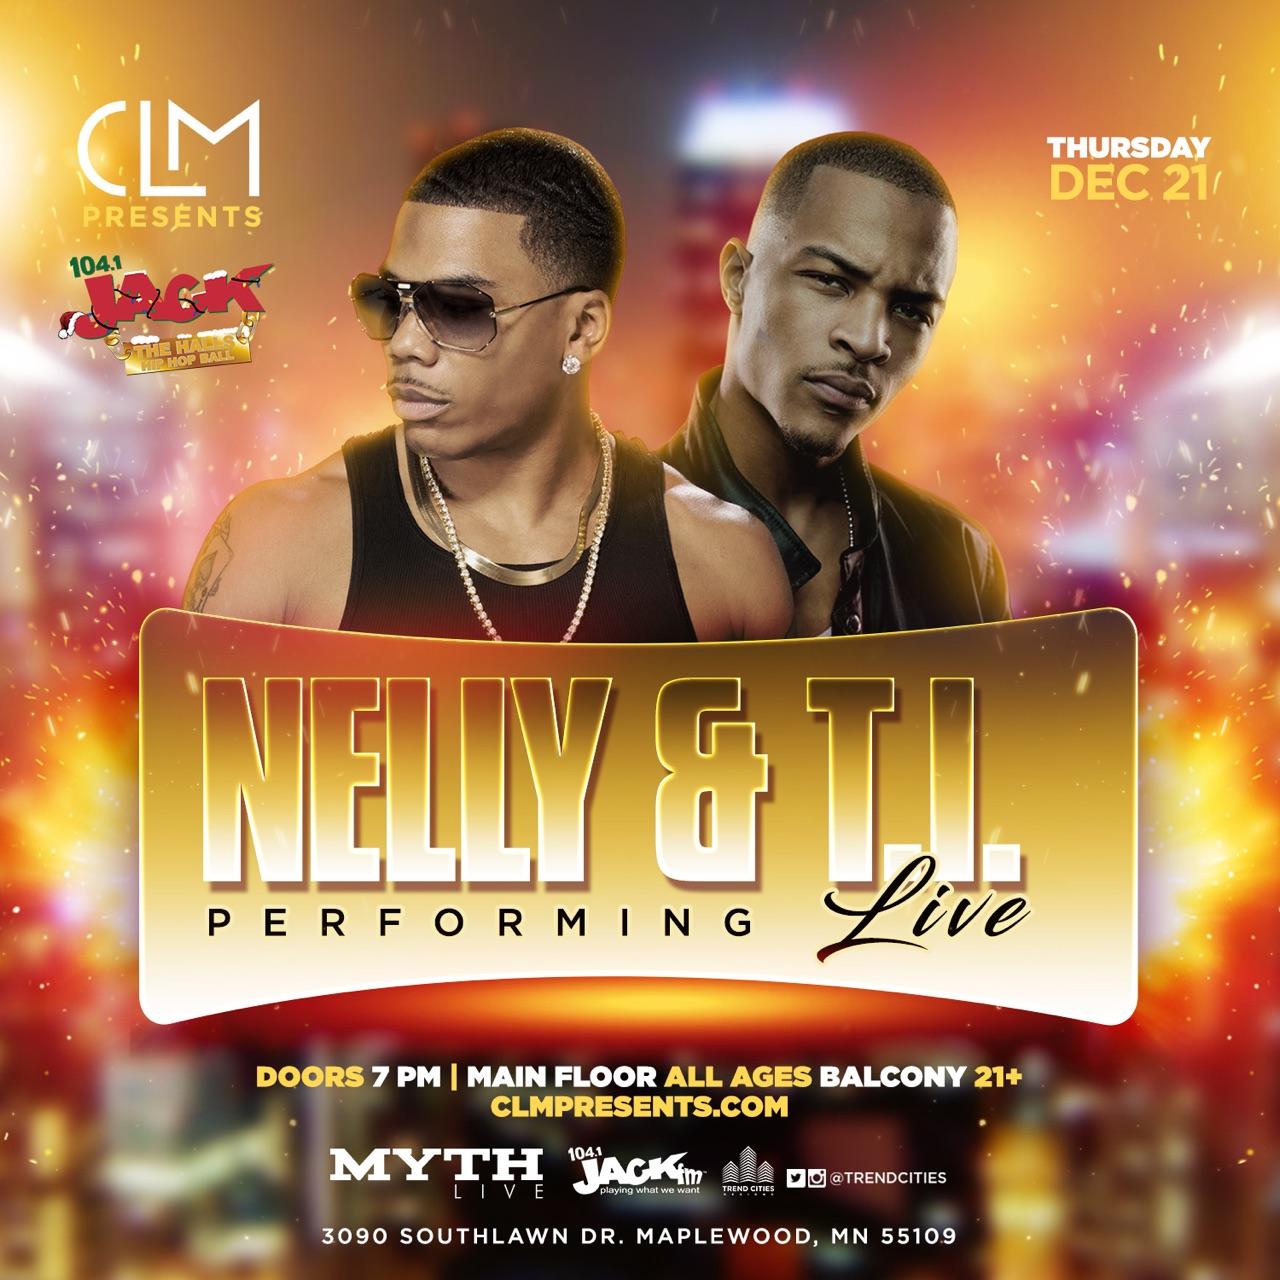 Nelly Ti Live Clm Presents Llc